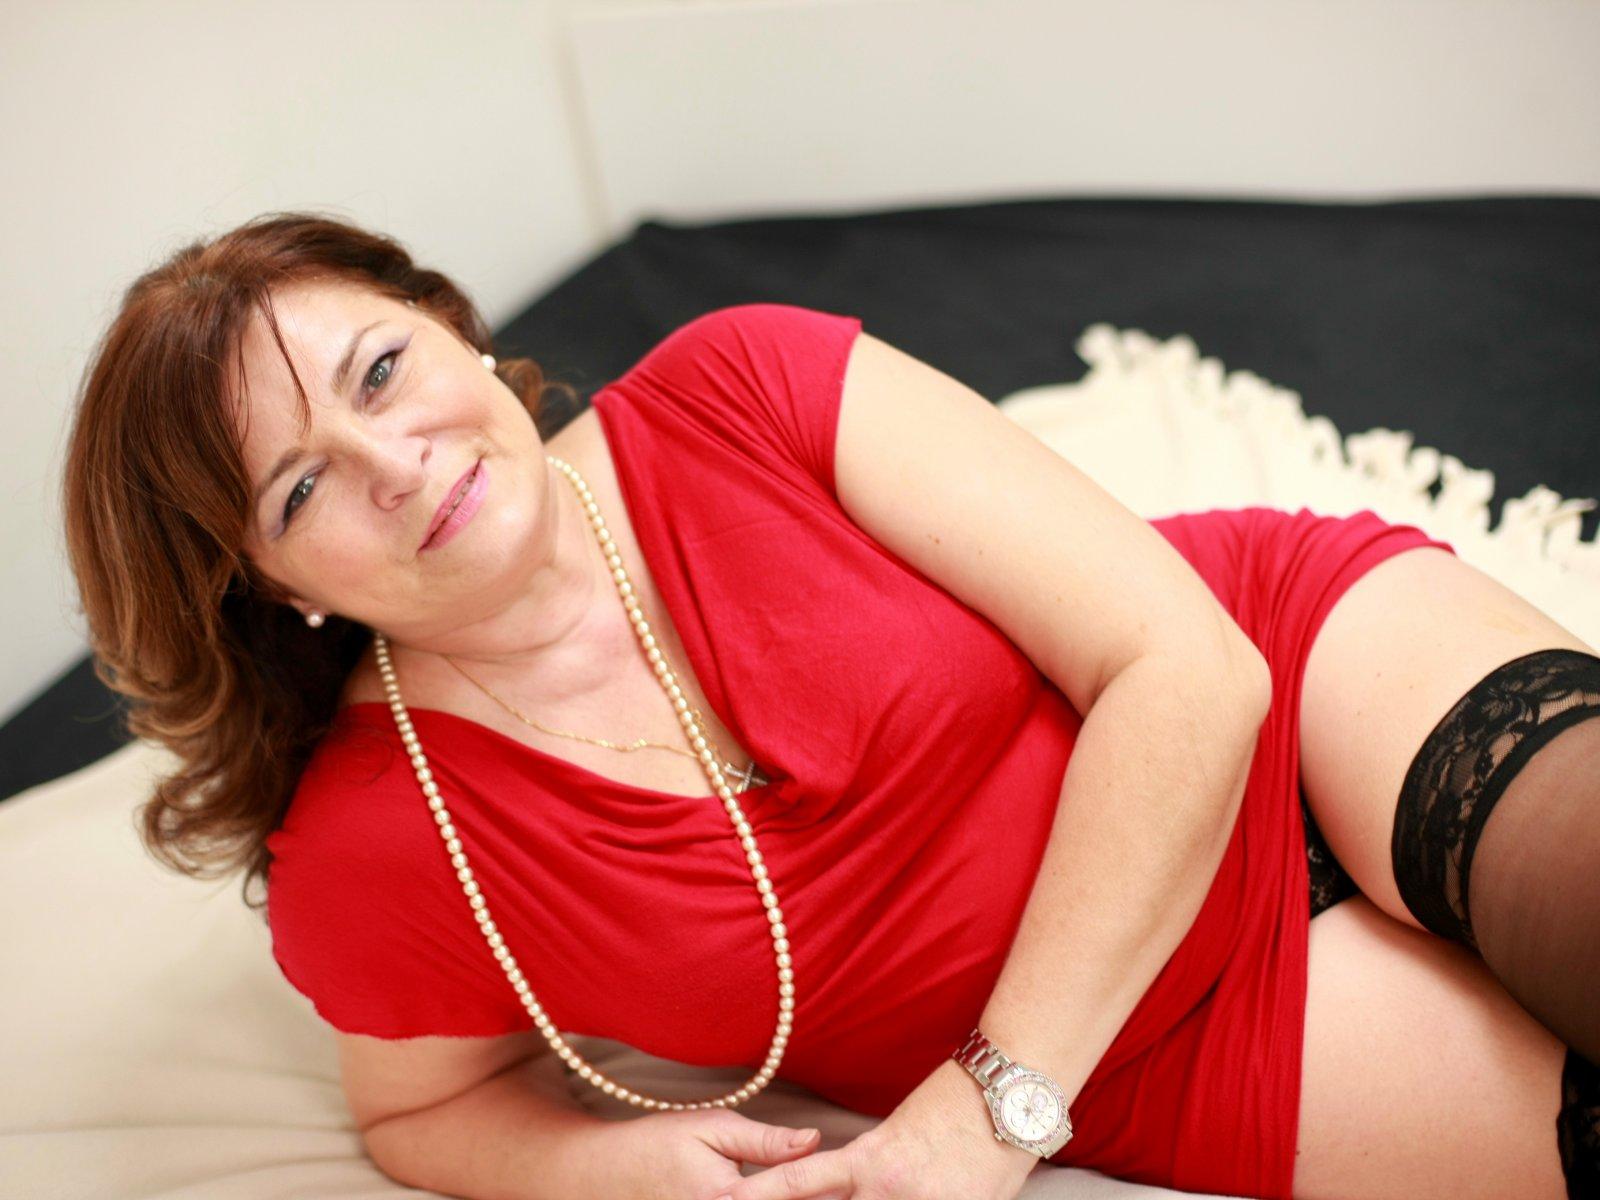 mature-woman-didi-pics